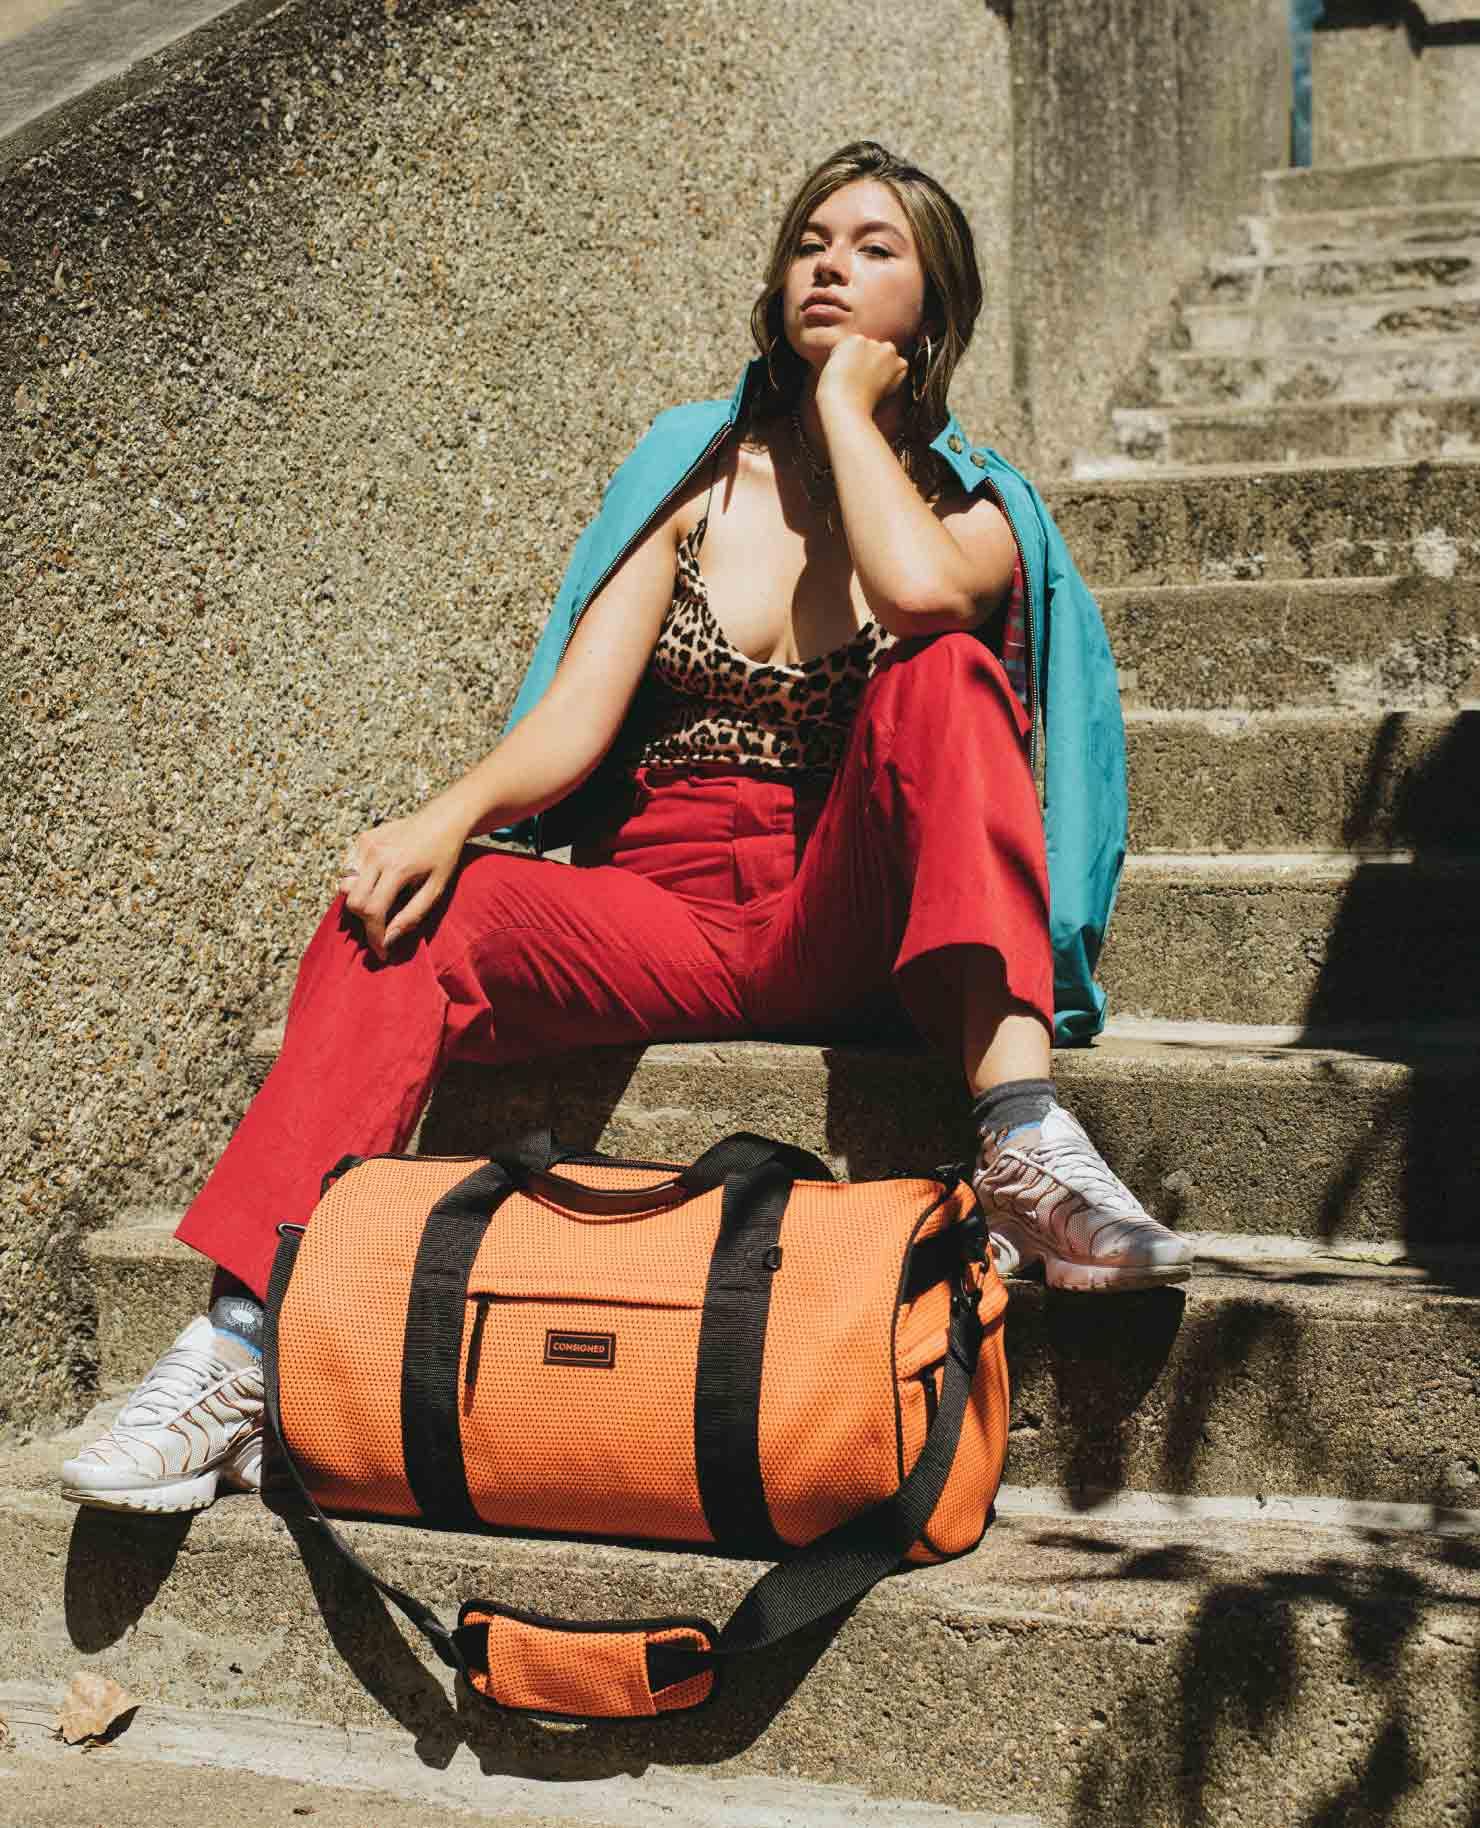 Ceara Maya Modeling The Saint Marlin Holdall In Orange On Stairs